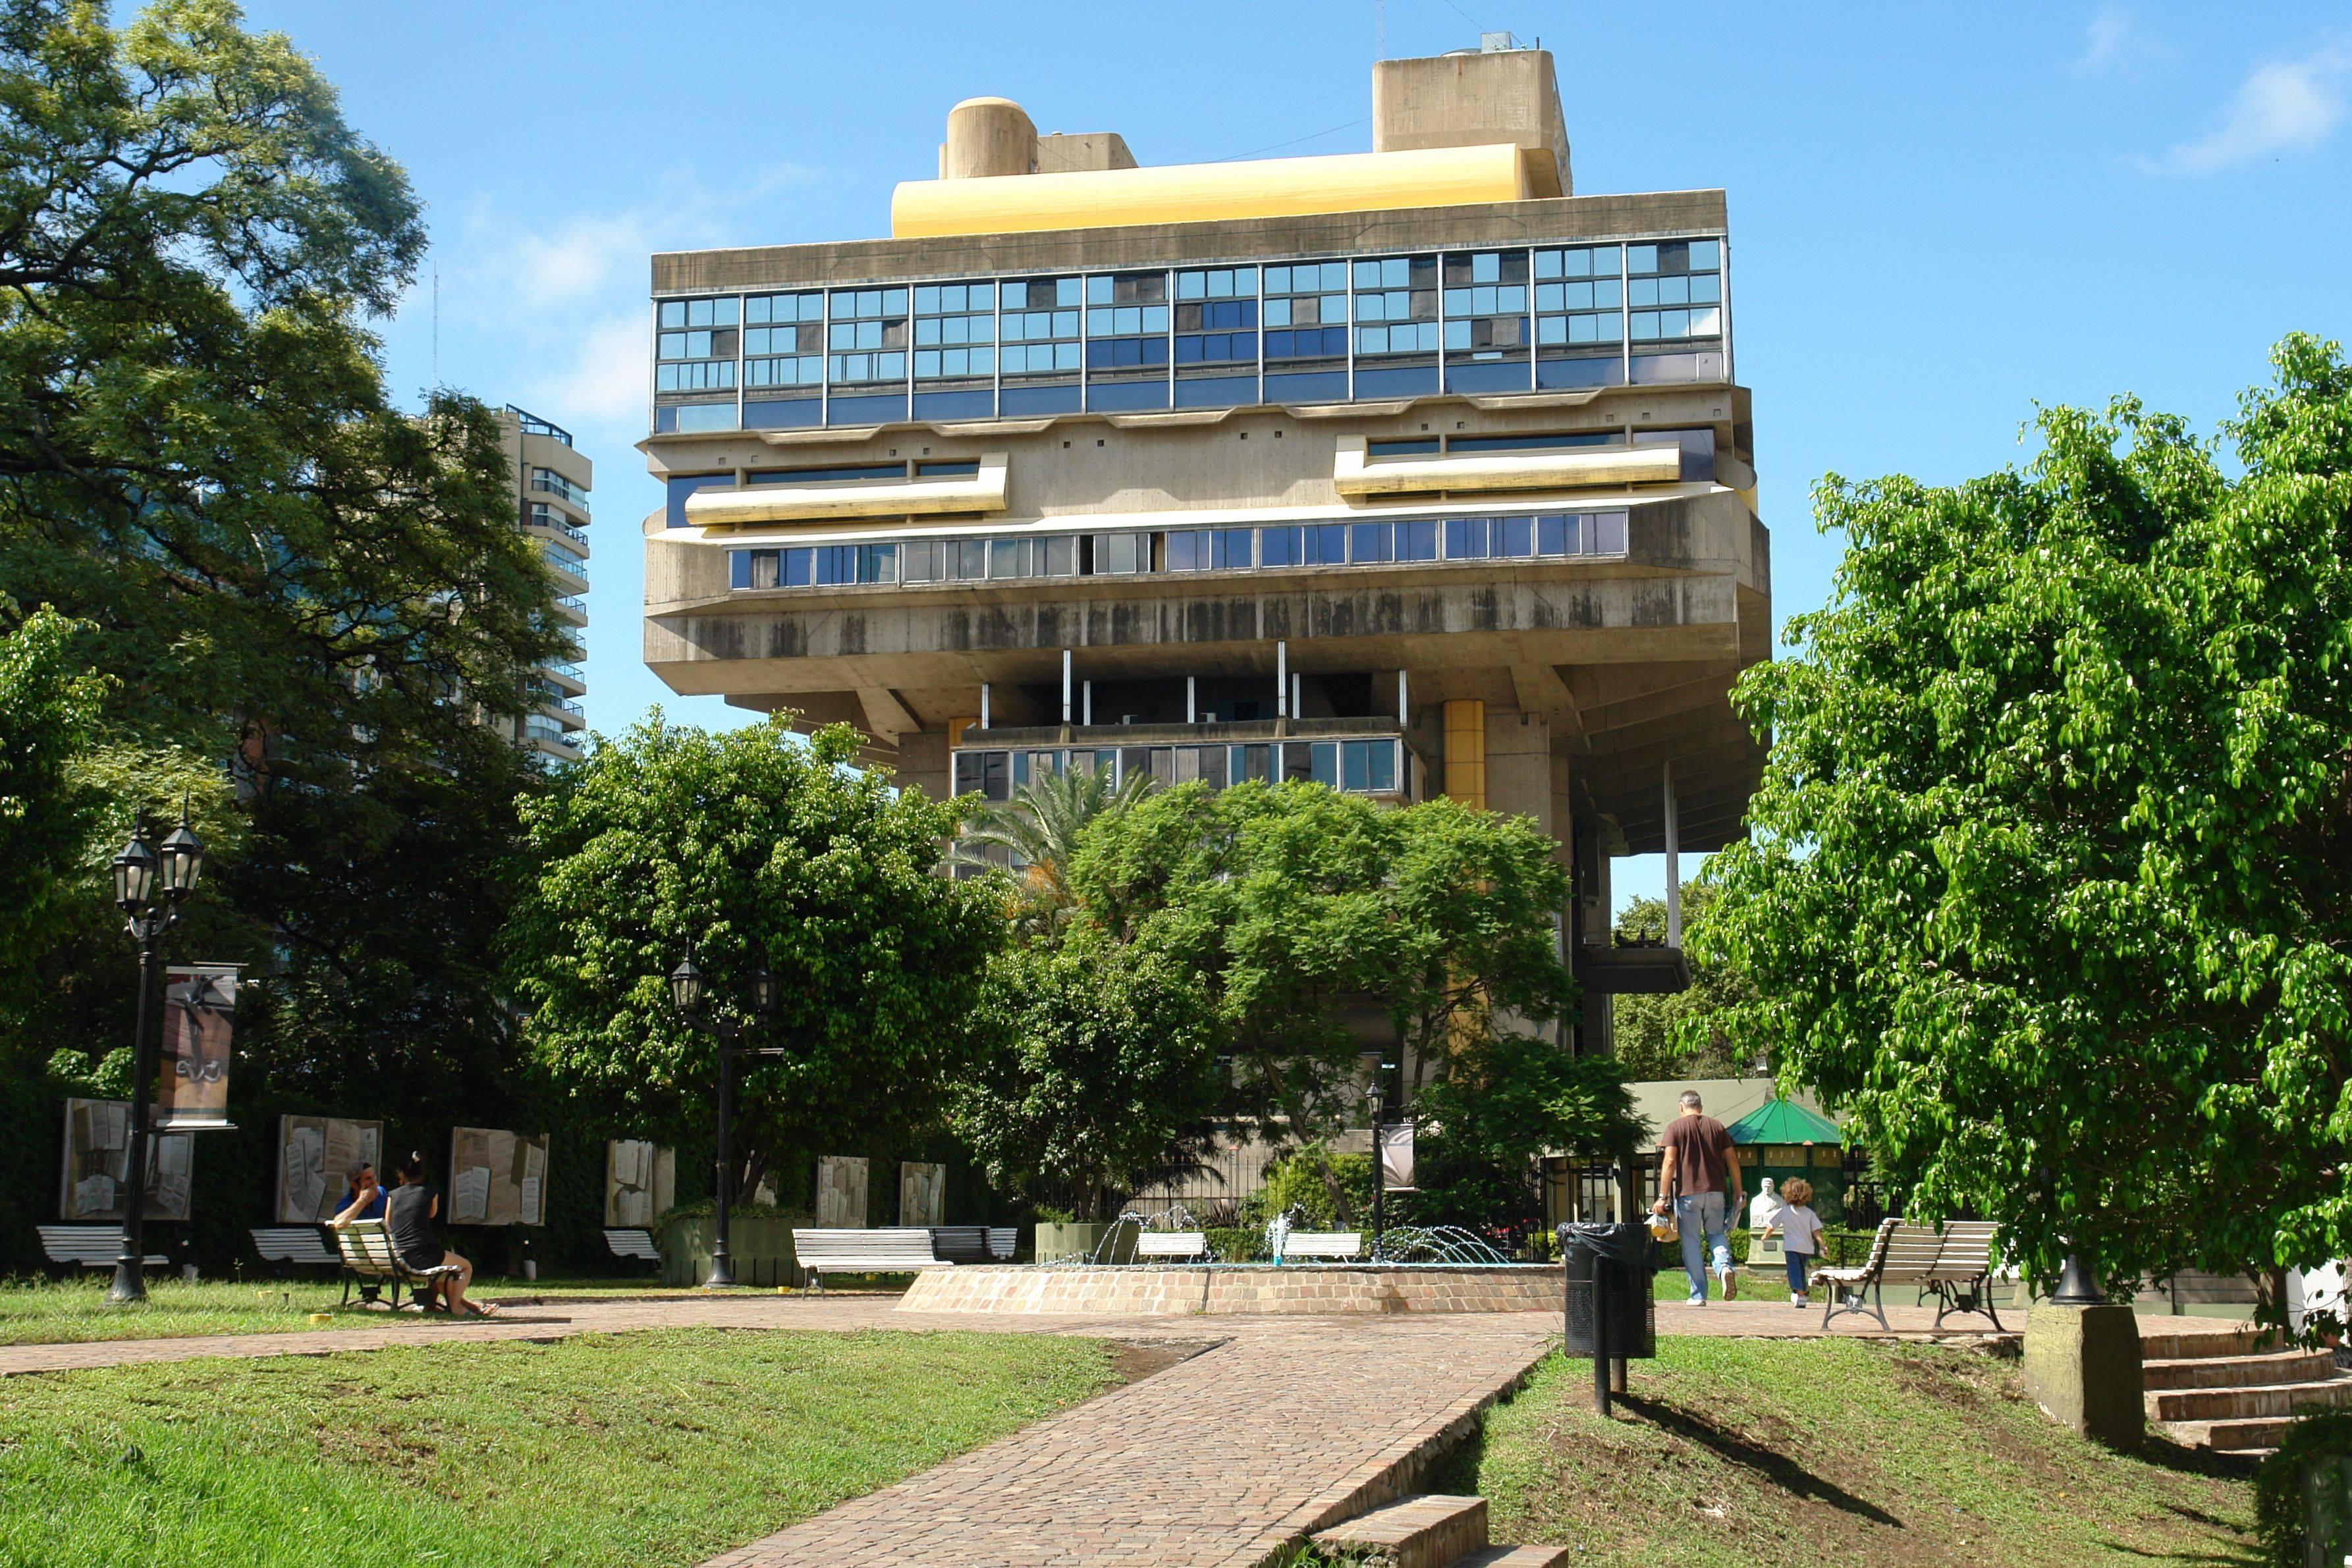 Biblioteca_Nacional_de_la_República_Argentina,_Buenos_Aires,_Argentina-21Feb2011